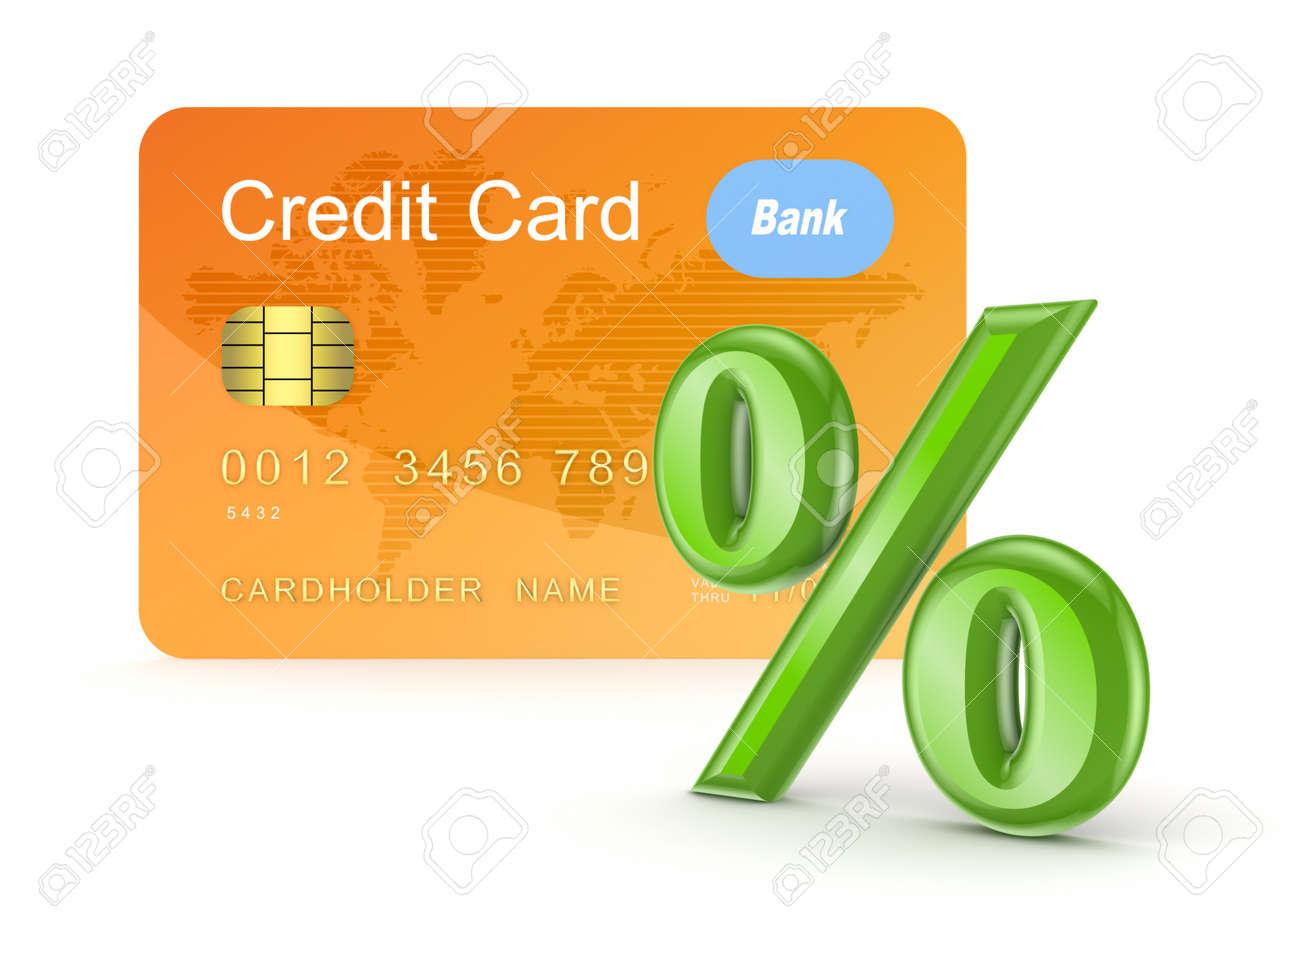 Credit card and percents symbol Stock Photo - 15654654